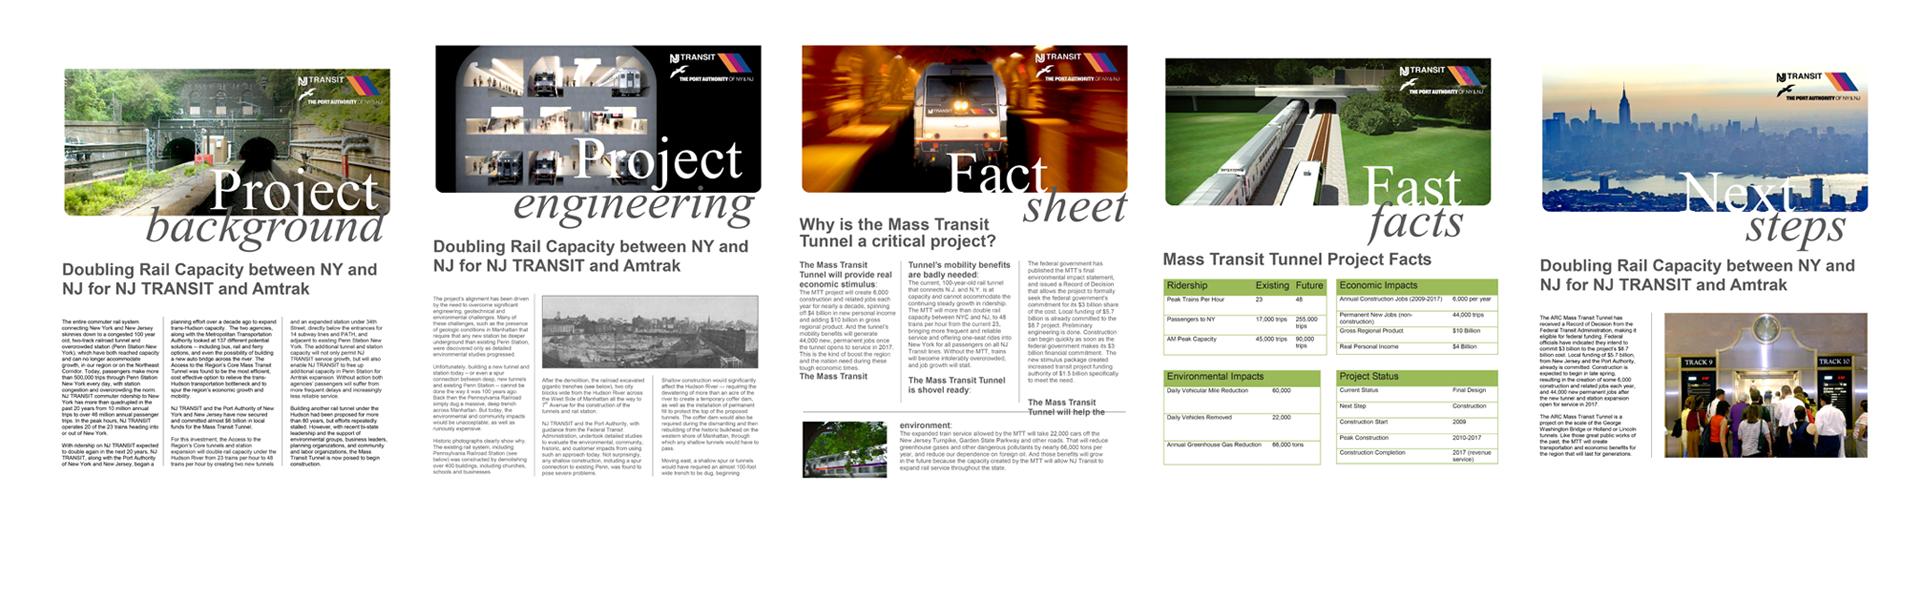 ARC (Access to the Region's Core) - Press Kit Design for NJ Transit